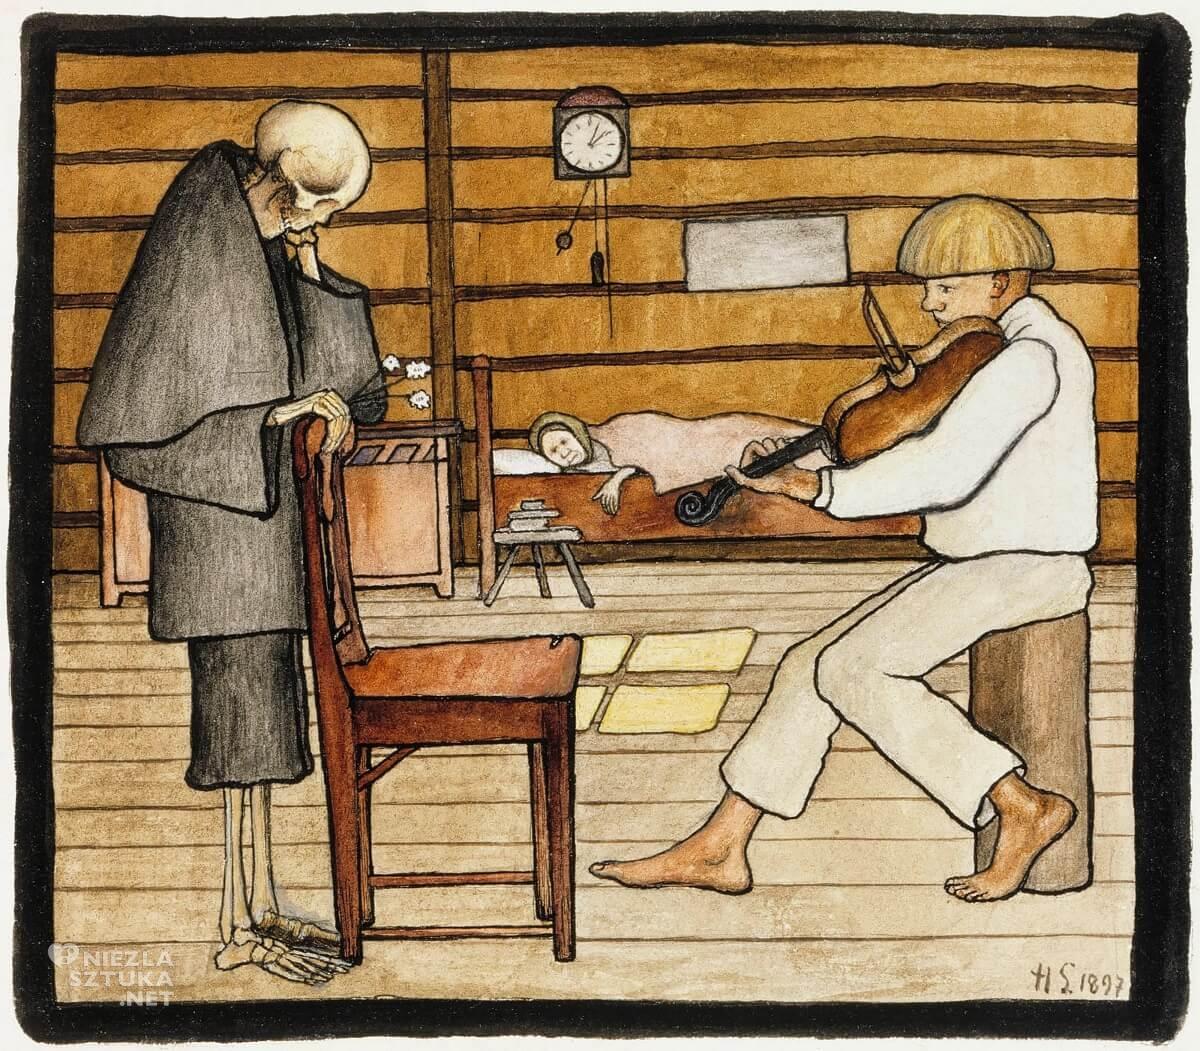 Hugo Simberg, sztuka skandynawska, Szwecja, Finlandia, symbolizm, Niezła Sztuka